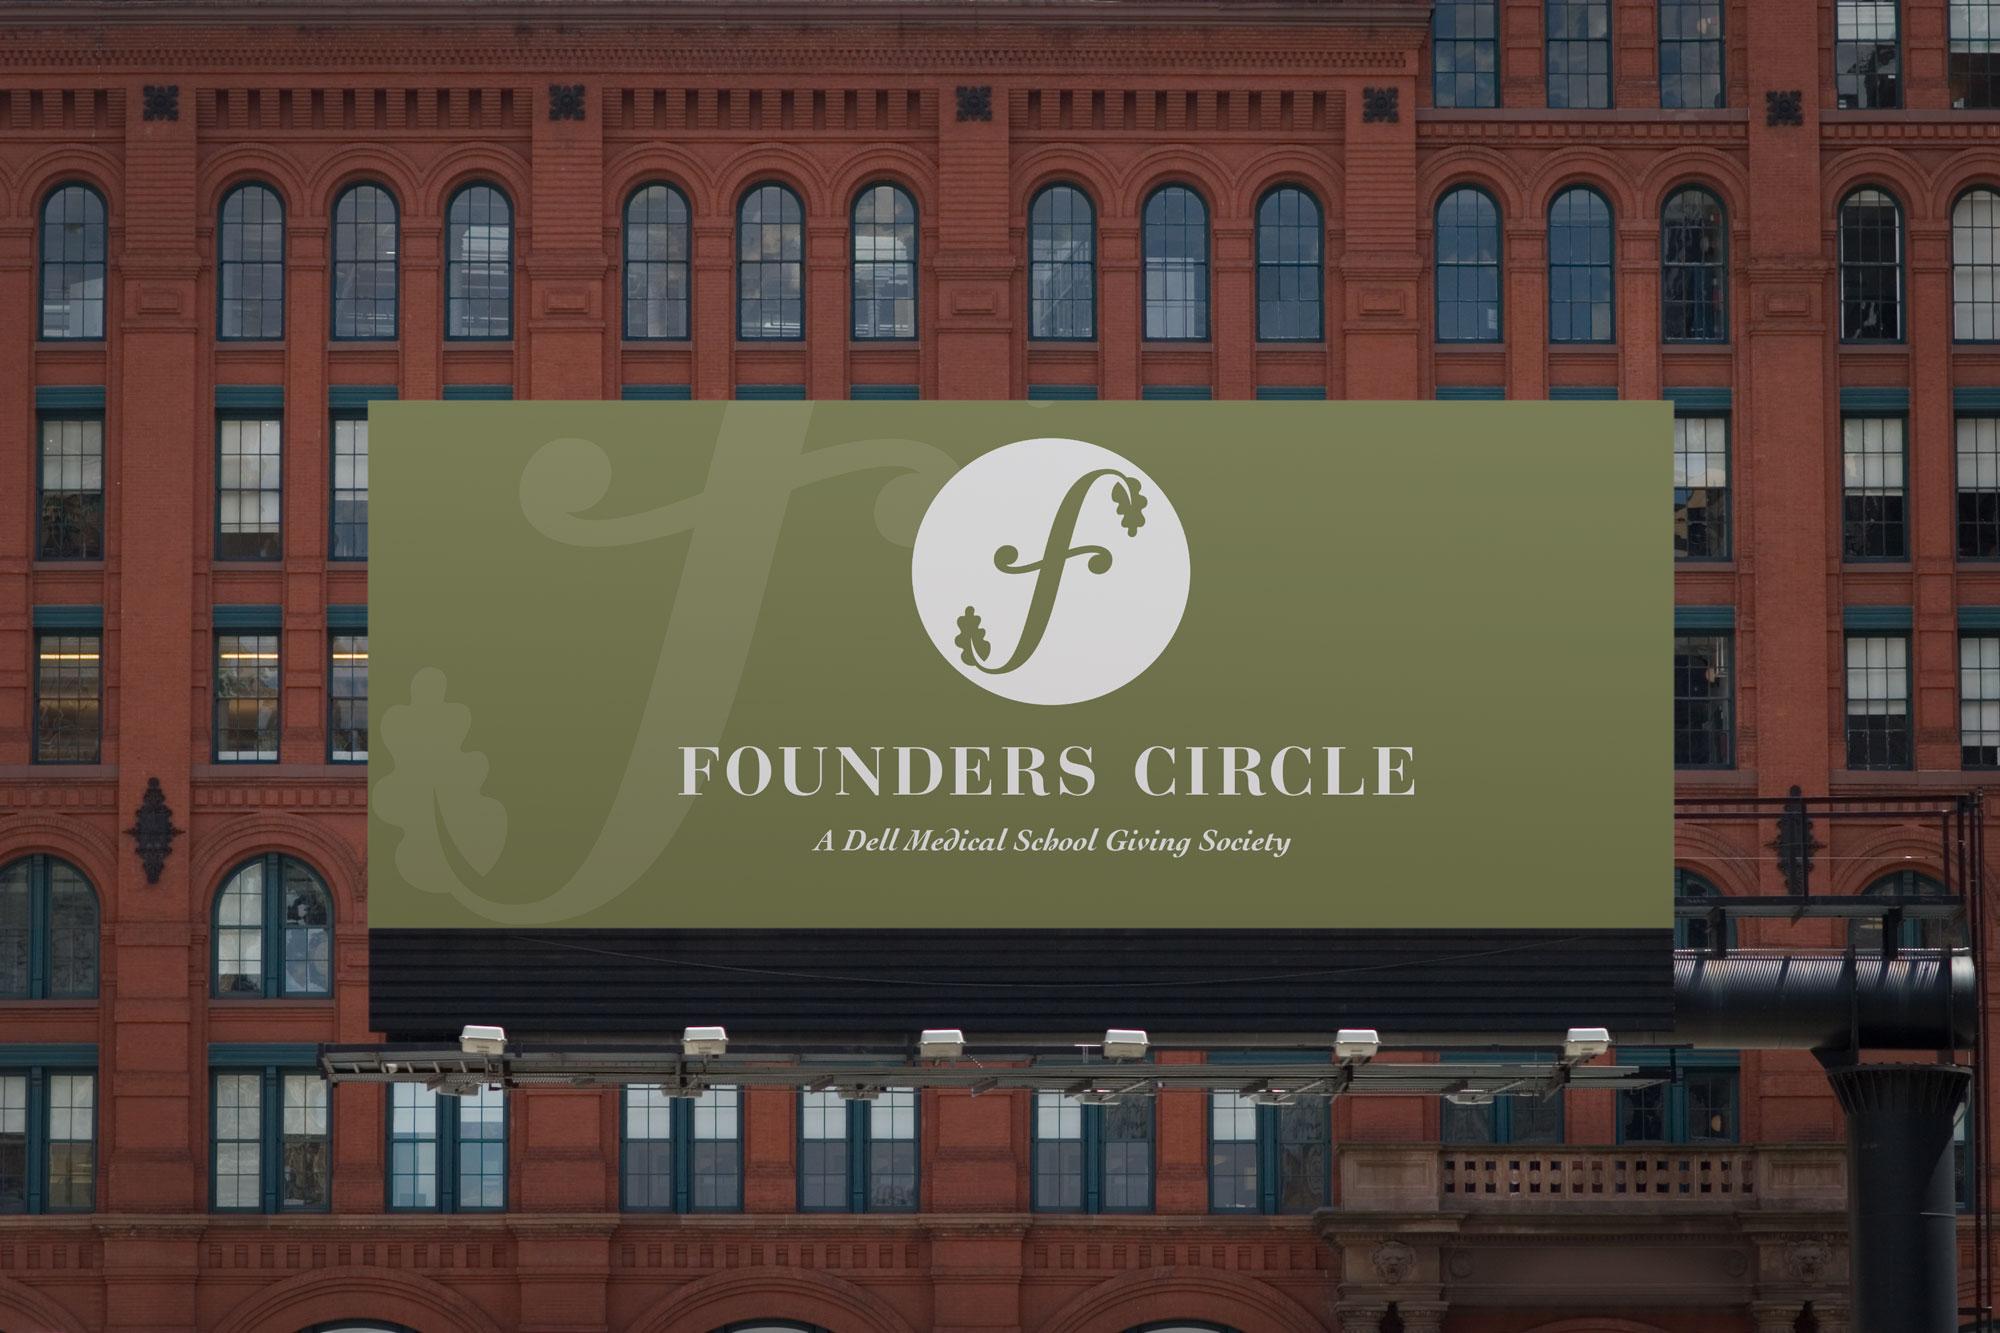 founders-circle-billboard.jpg